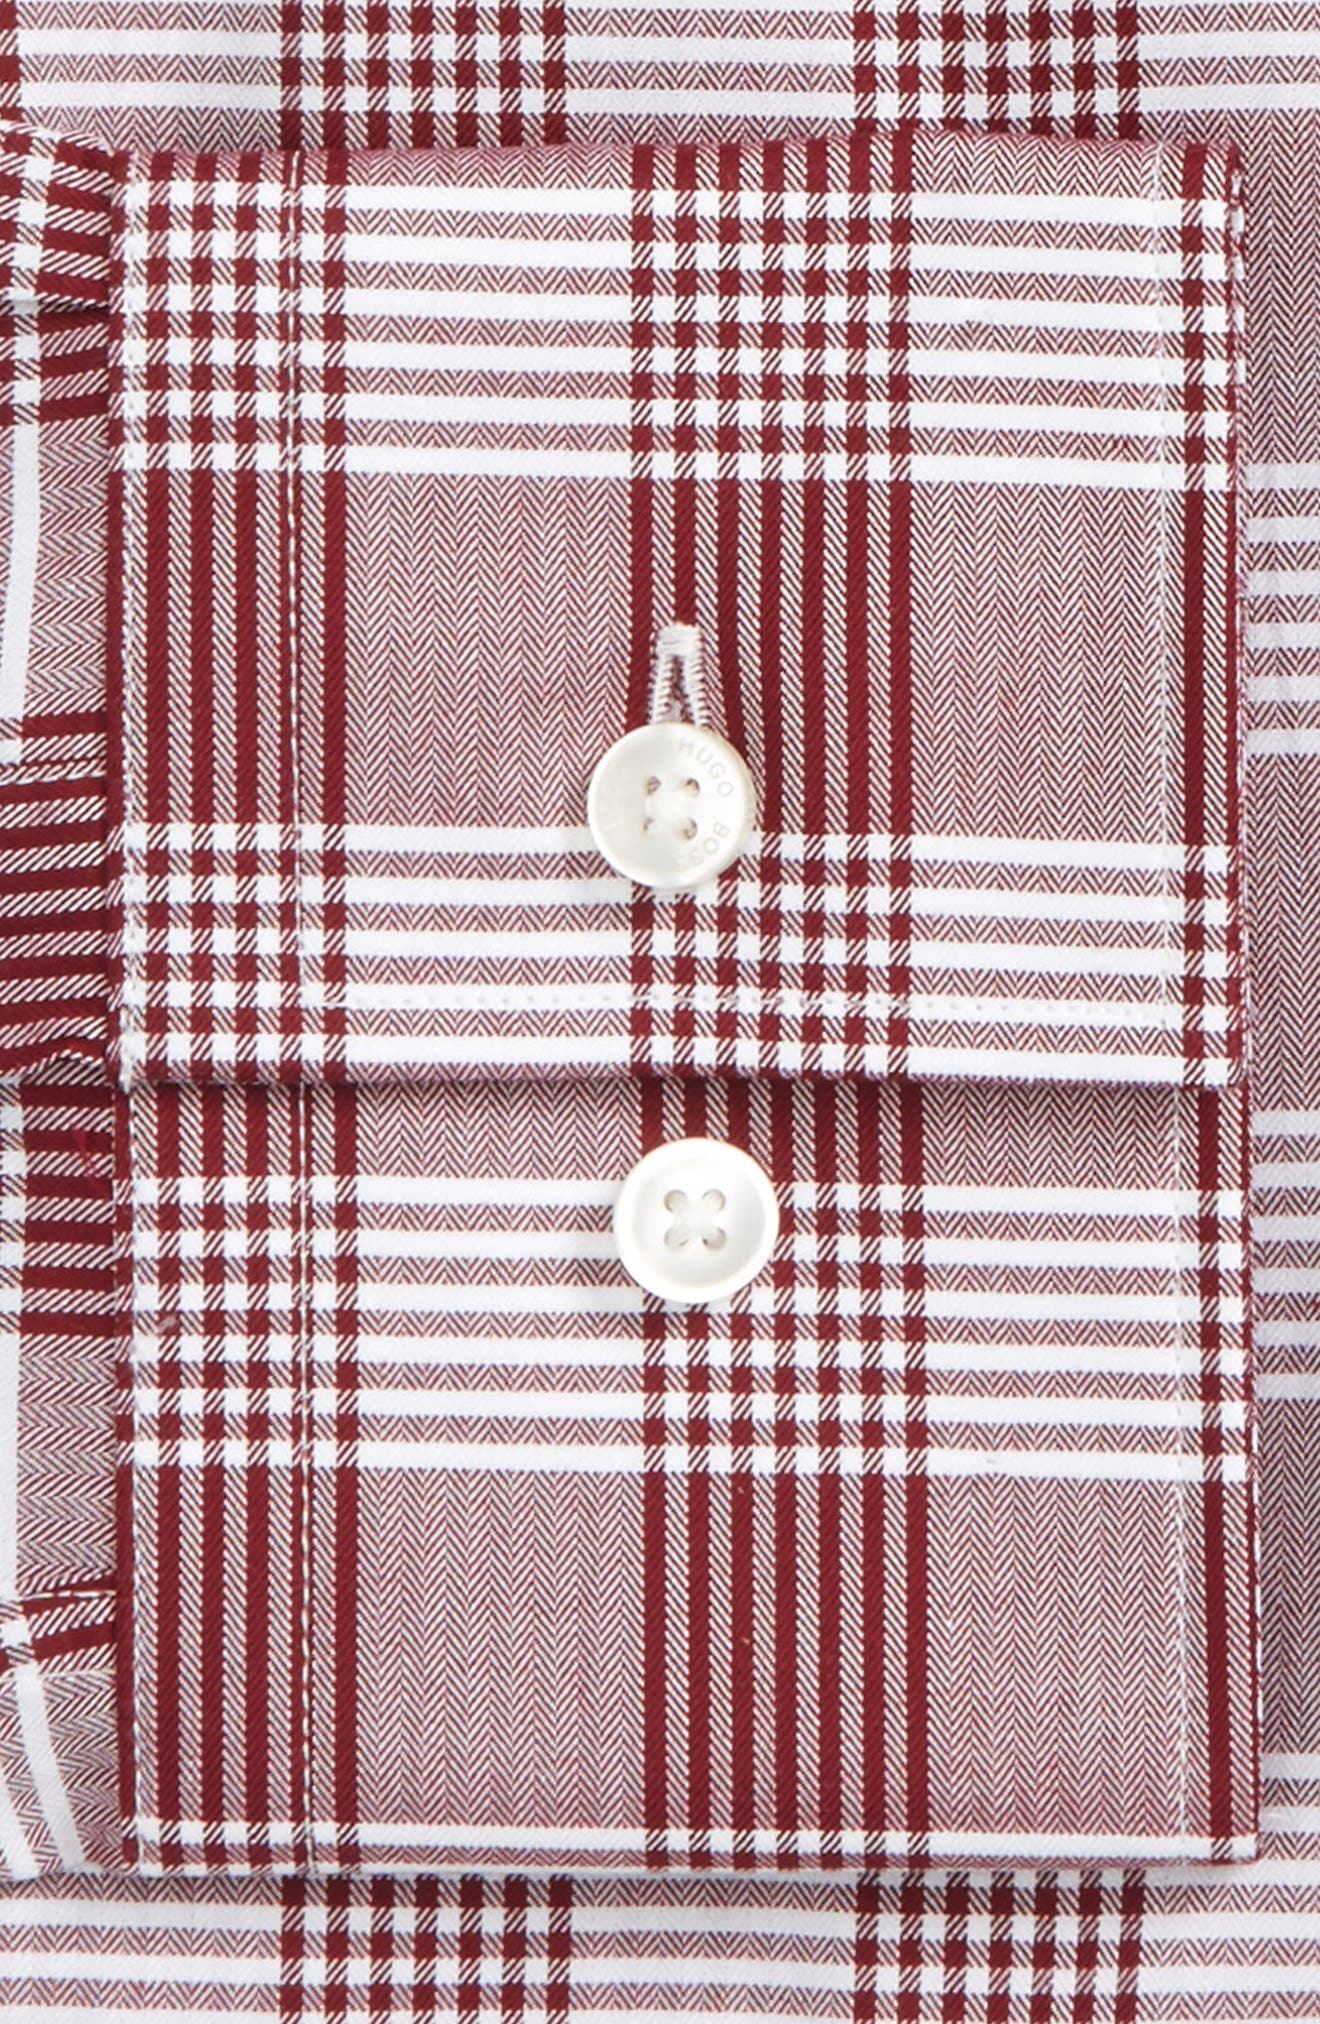 Jason Slim Fit Plaid Dress Shirt,                             Alternate thumbnail 2, color,                             Red